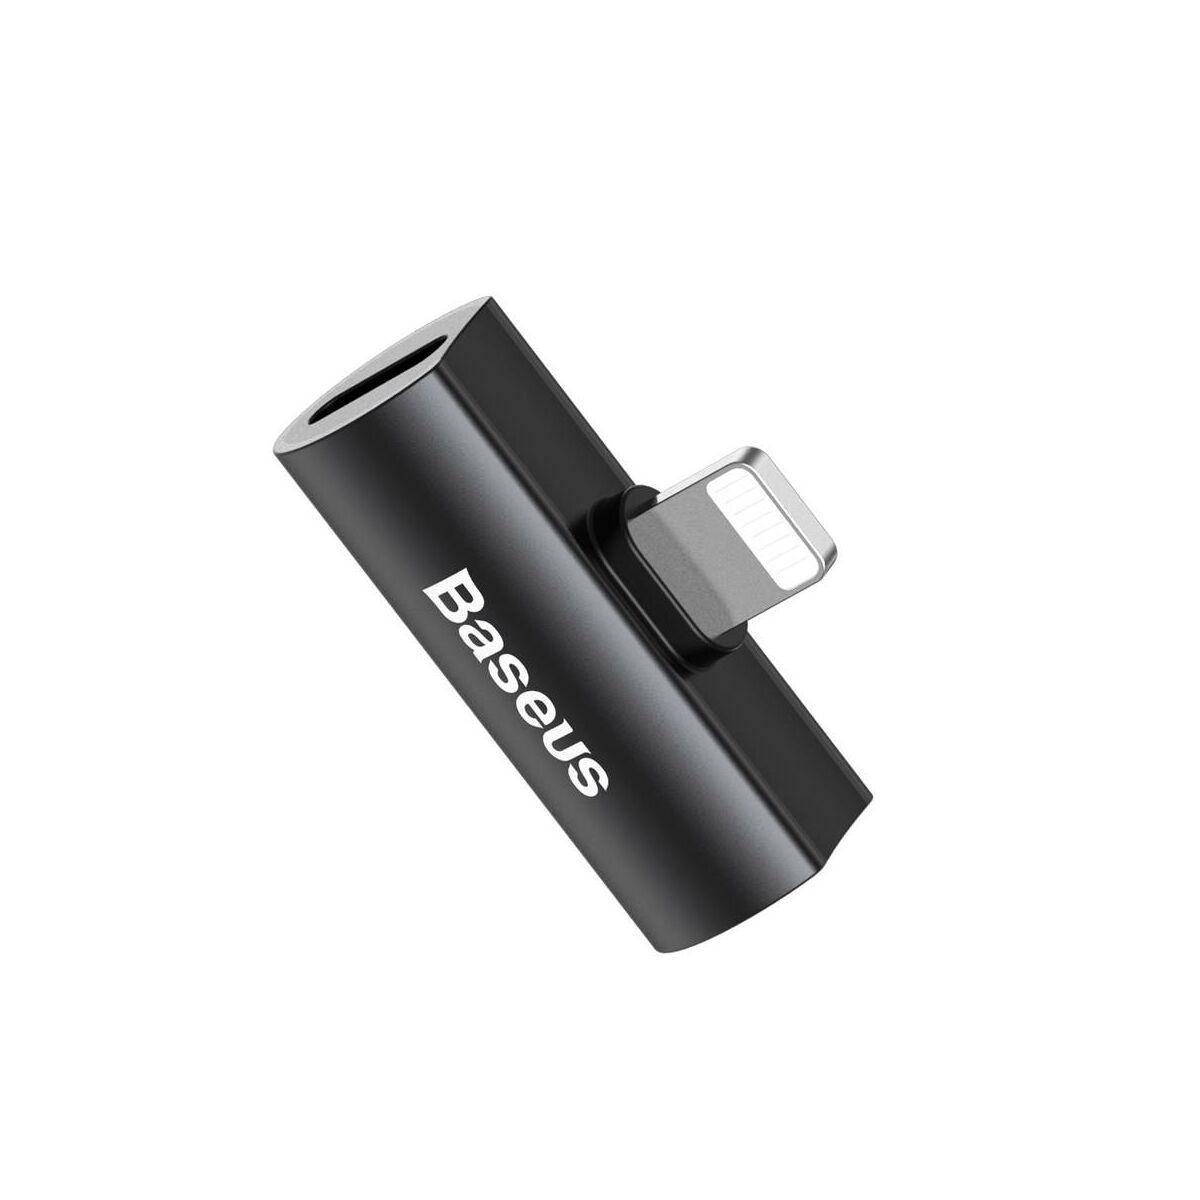 Baseus átalakító, L46 Lightning [apa] - Dual Lightning [anya] adapter, fekete (CAL46-01)